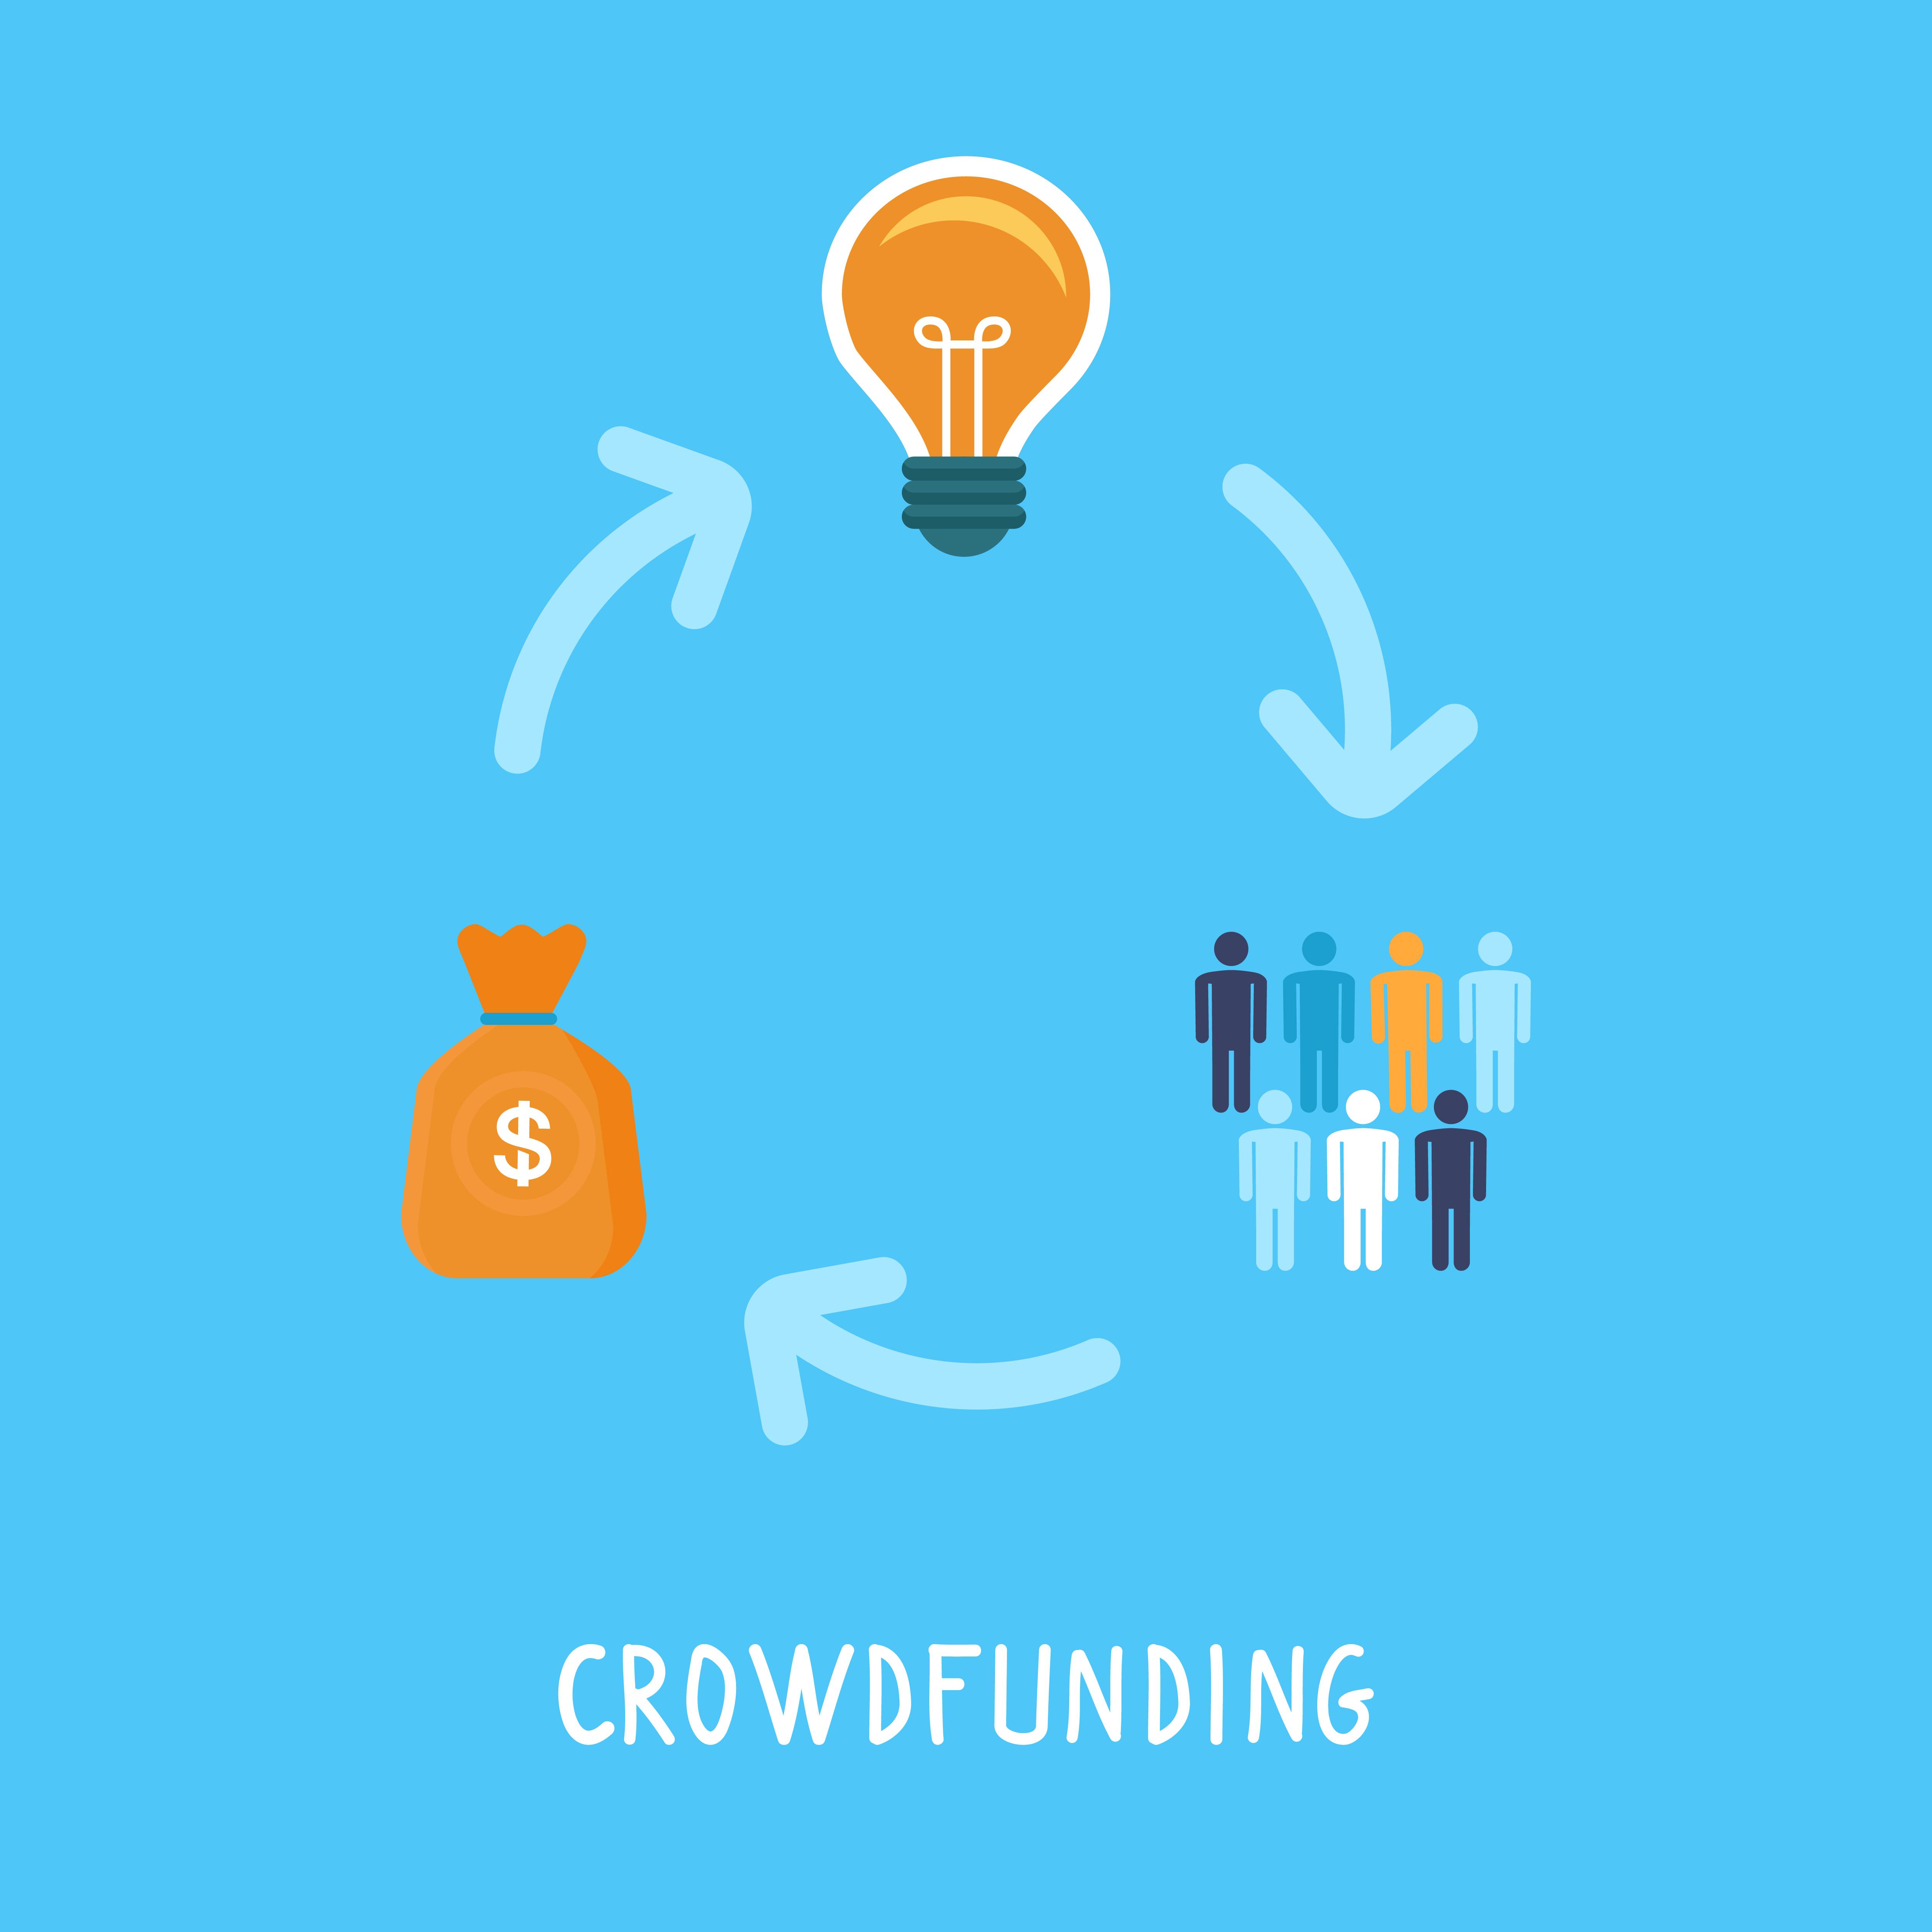 le crowdfunding cartonne en r233gion bruxelloise didier gosuin